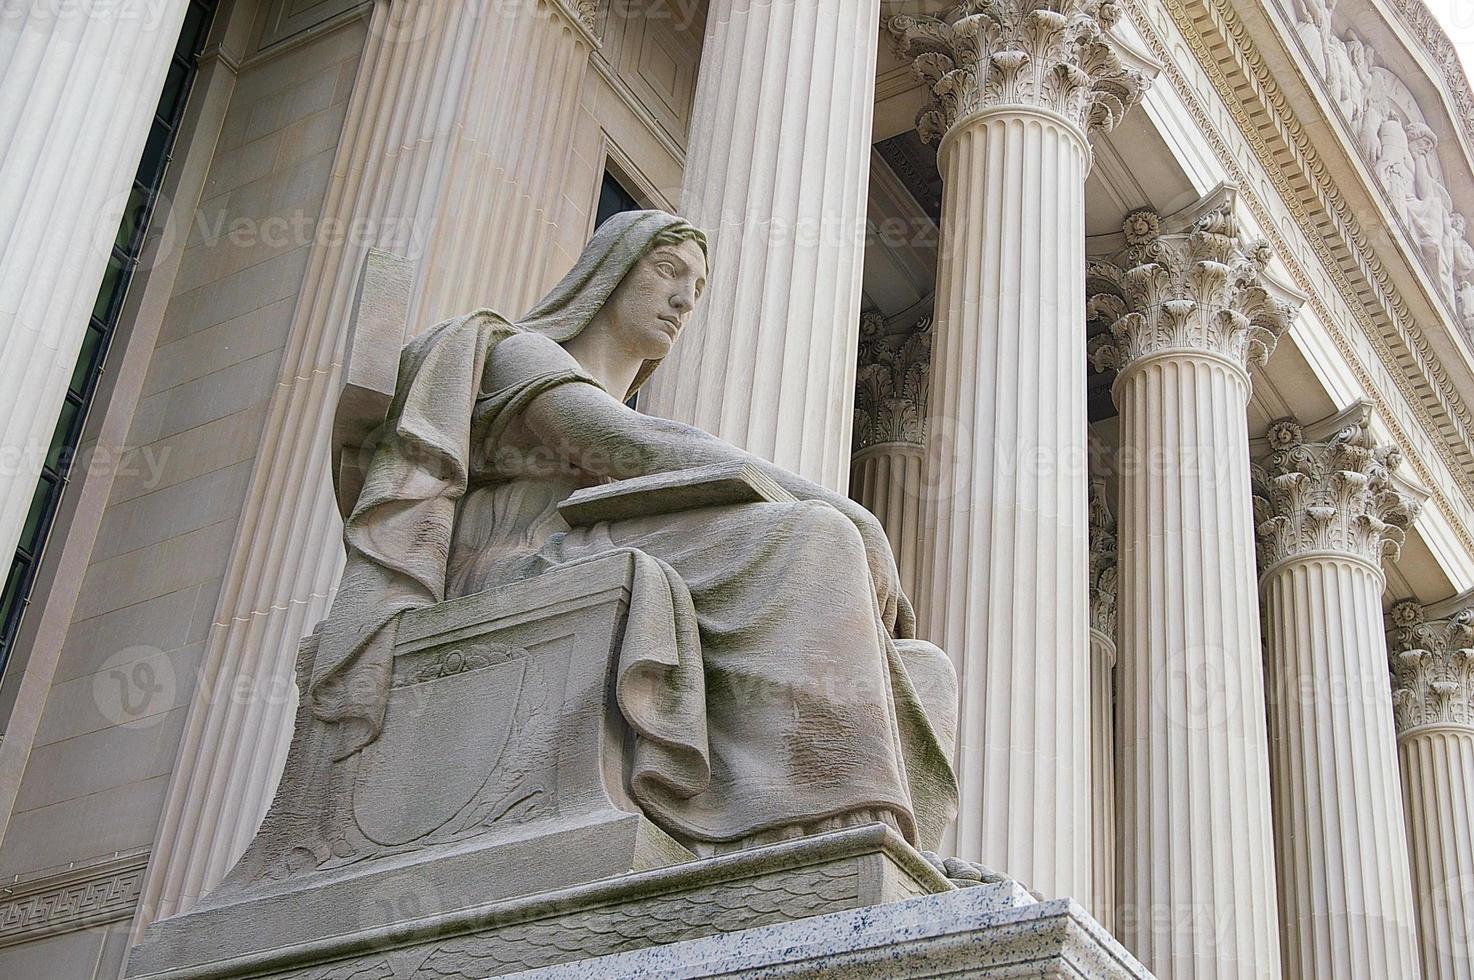 The Supreme Court photo